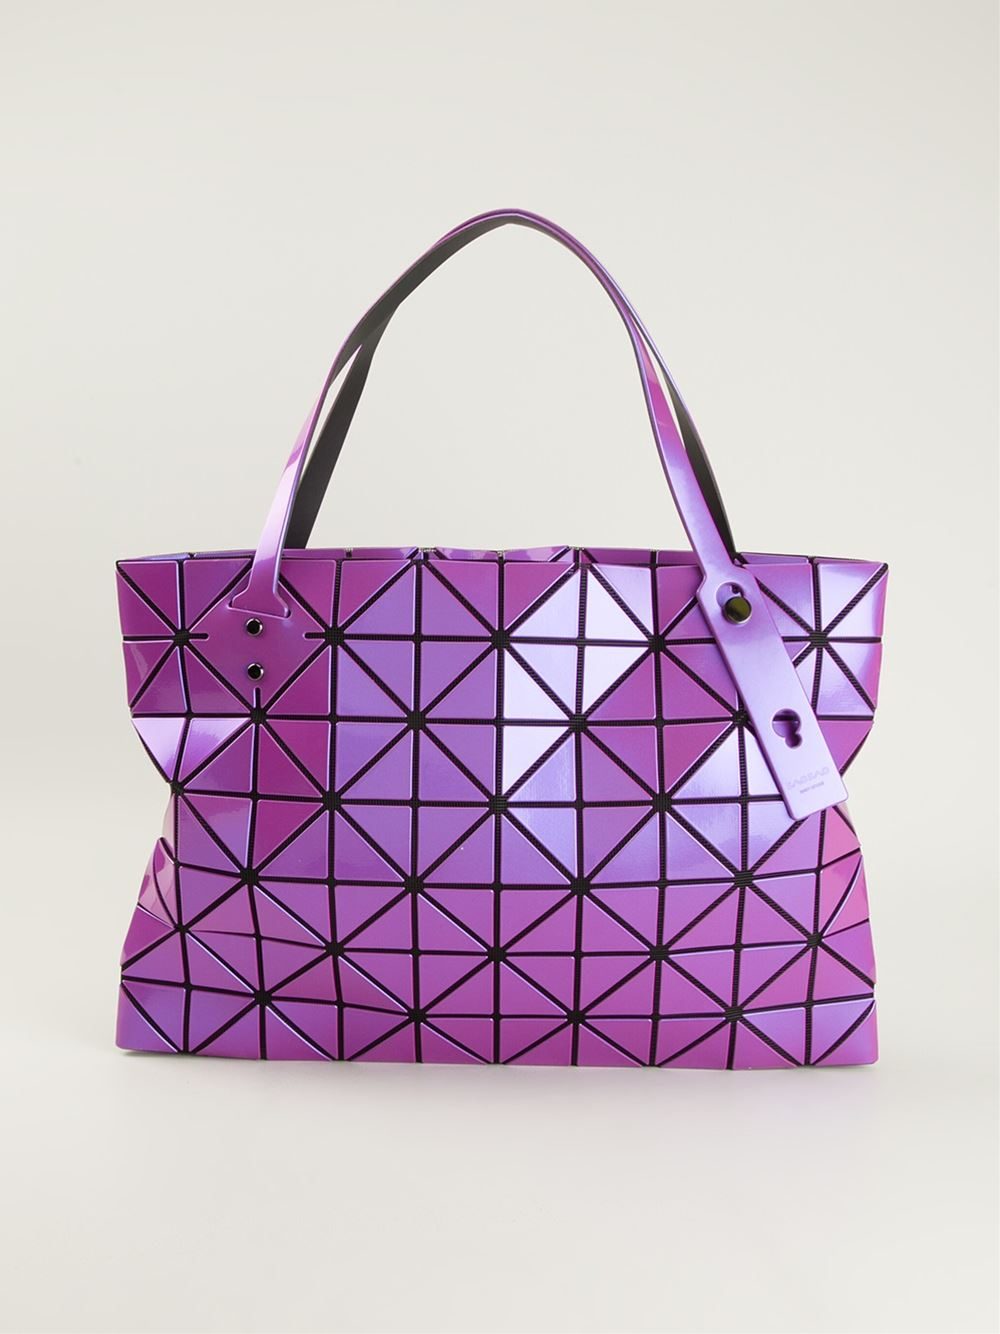 Lyst - Bao Bao Issey Miyake Prism Tote in Purple